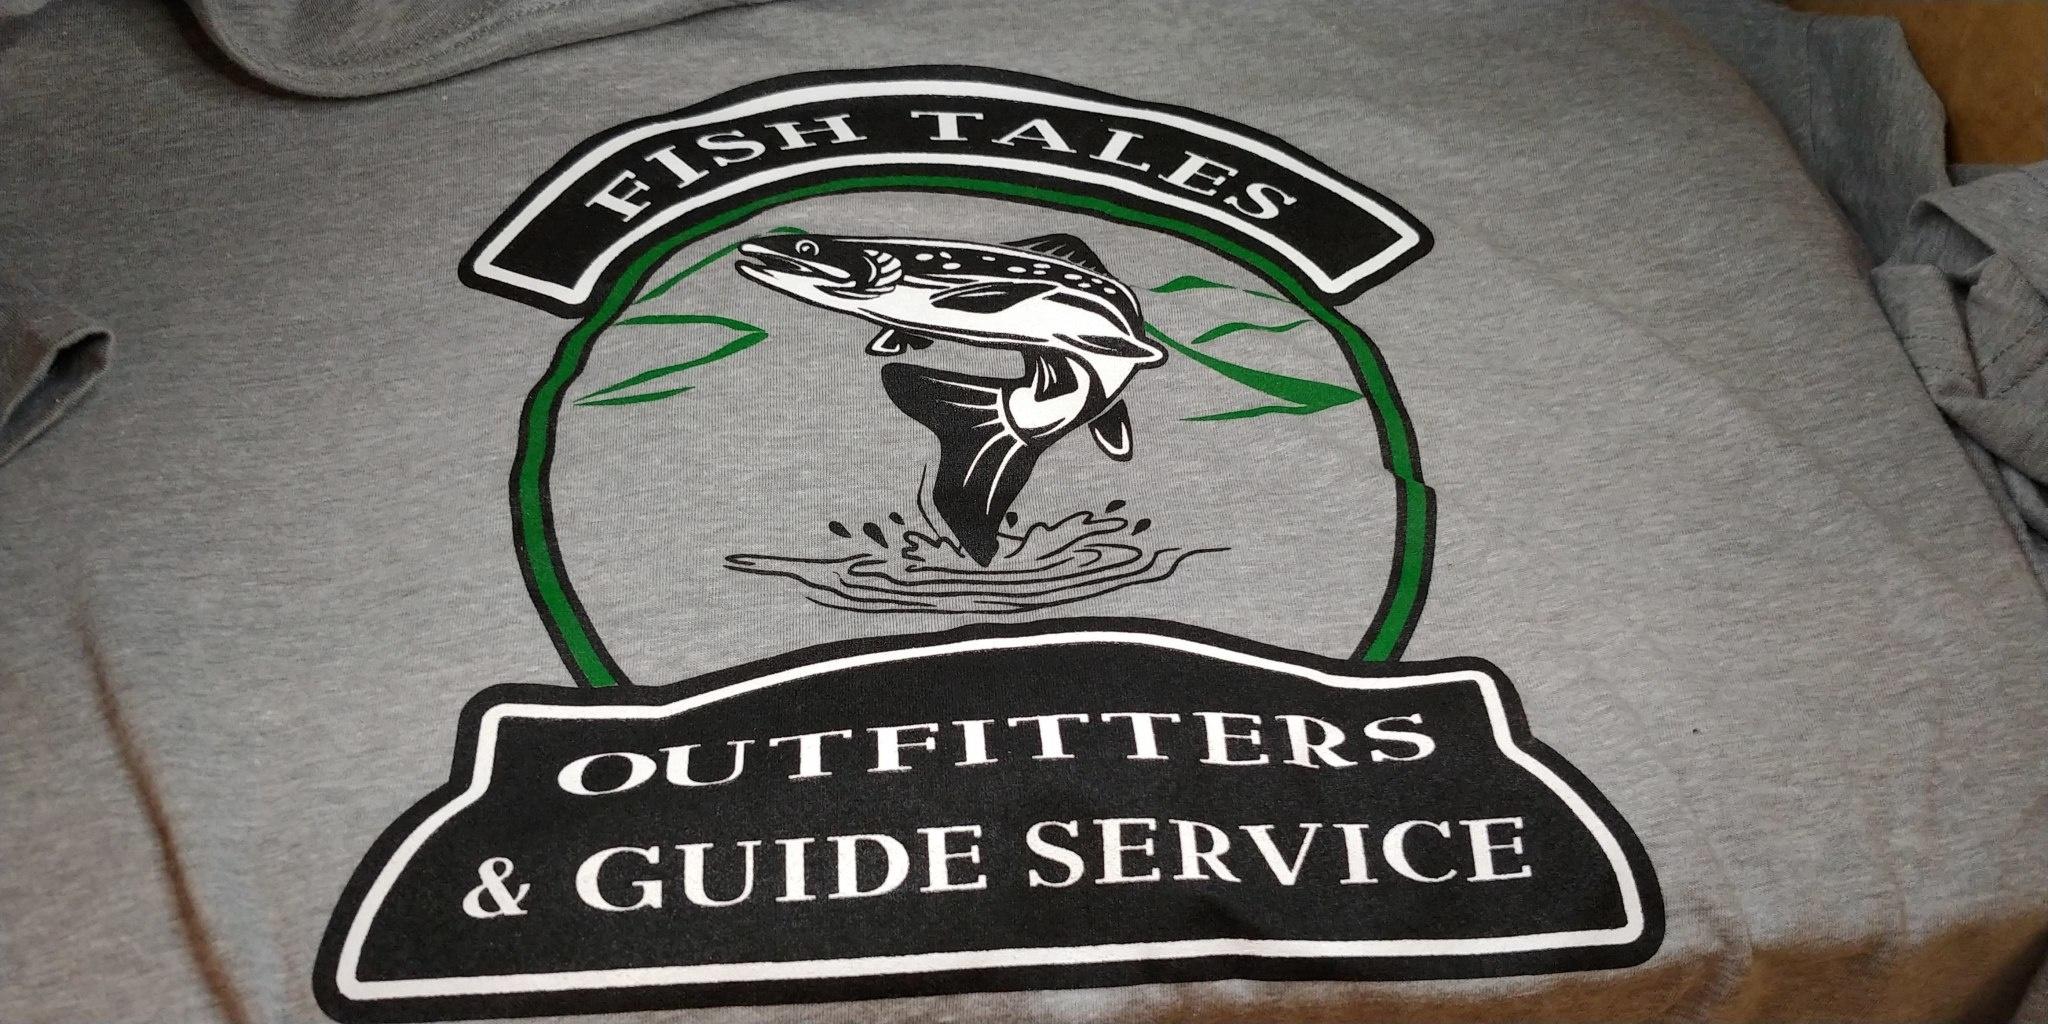 Next Level Apparel Fish Tales Logo Shirt - Gray with pocket Logo and Full logo on Back